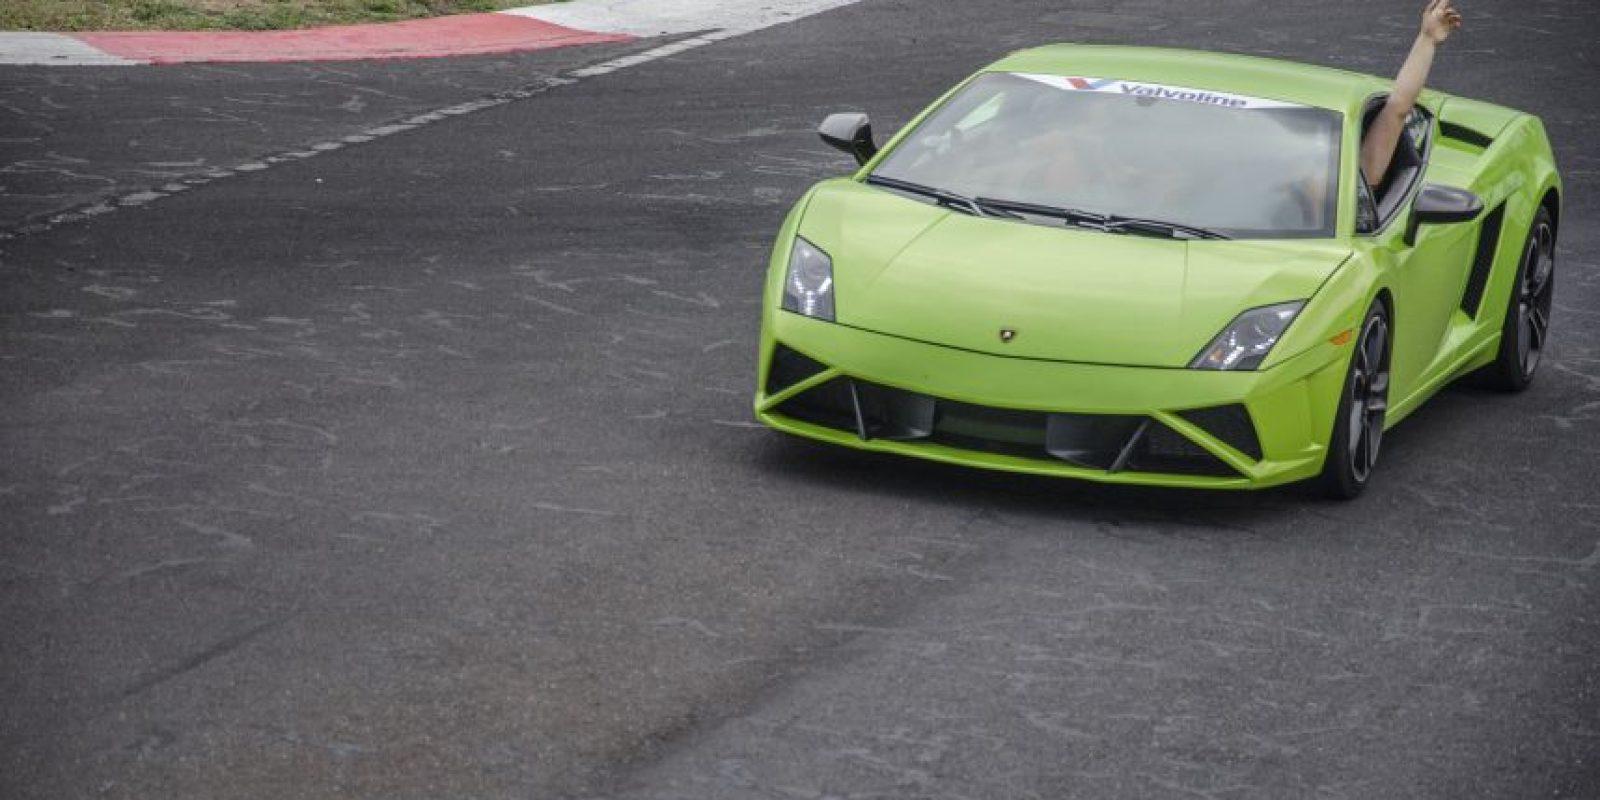 Lamborghini LP560 Gallardo Foto:LUIS CARLOS NÁJERA